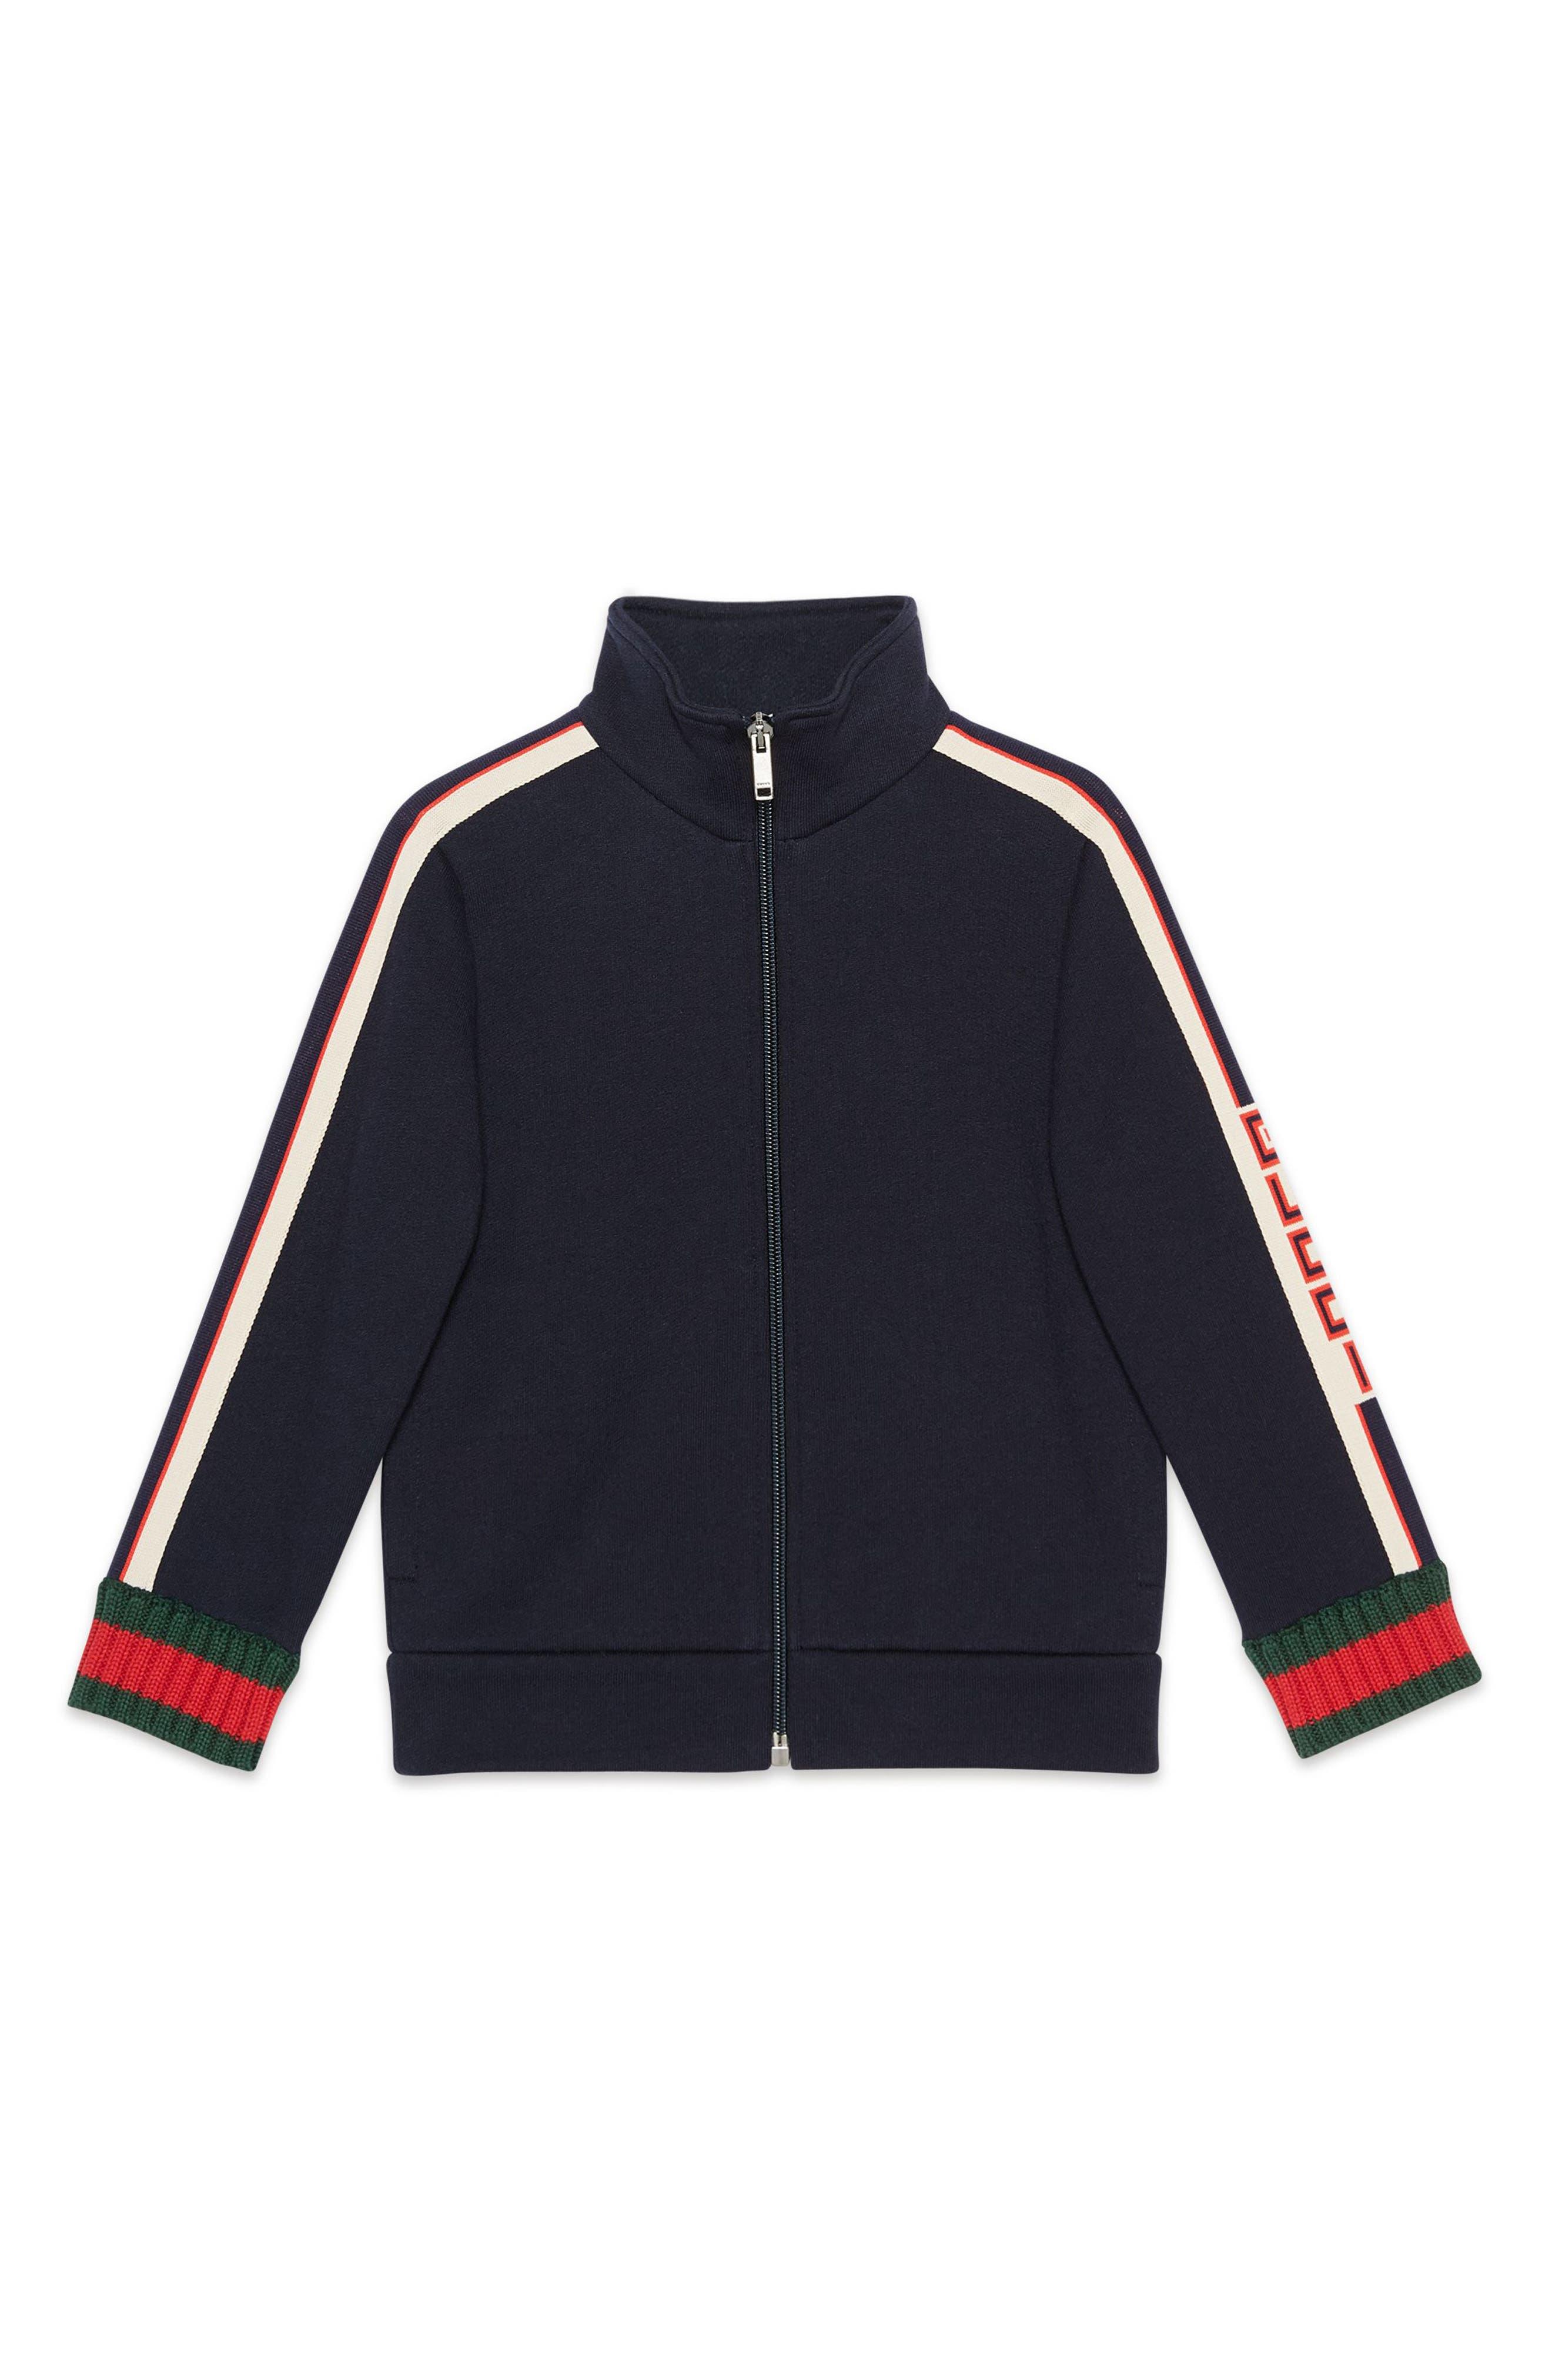 GUCCI, Logo Track Jacket, Main thumbnail 1, color, PERIWINKLE MULTI